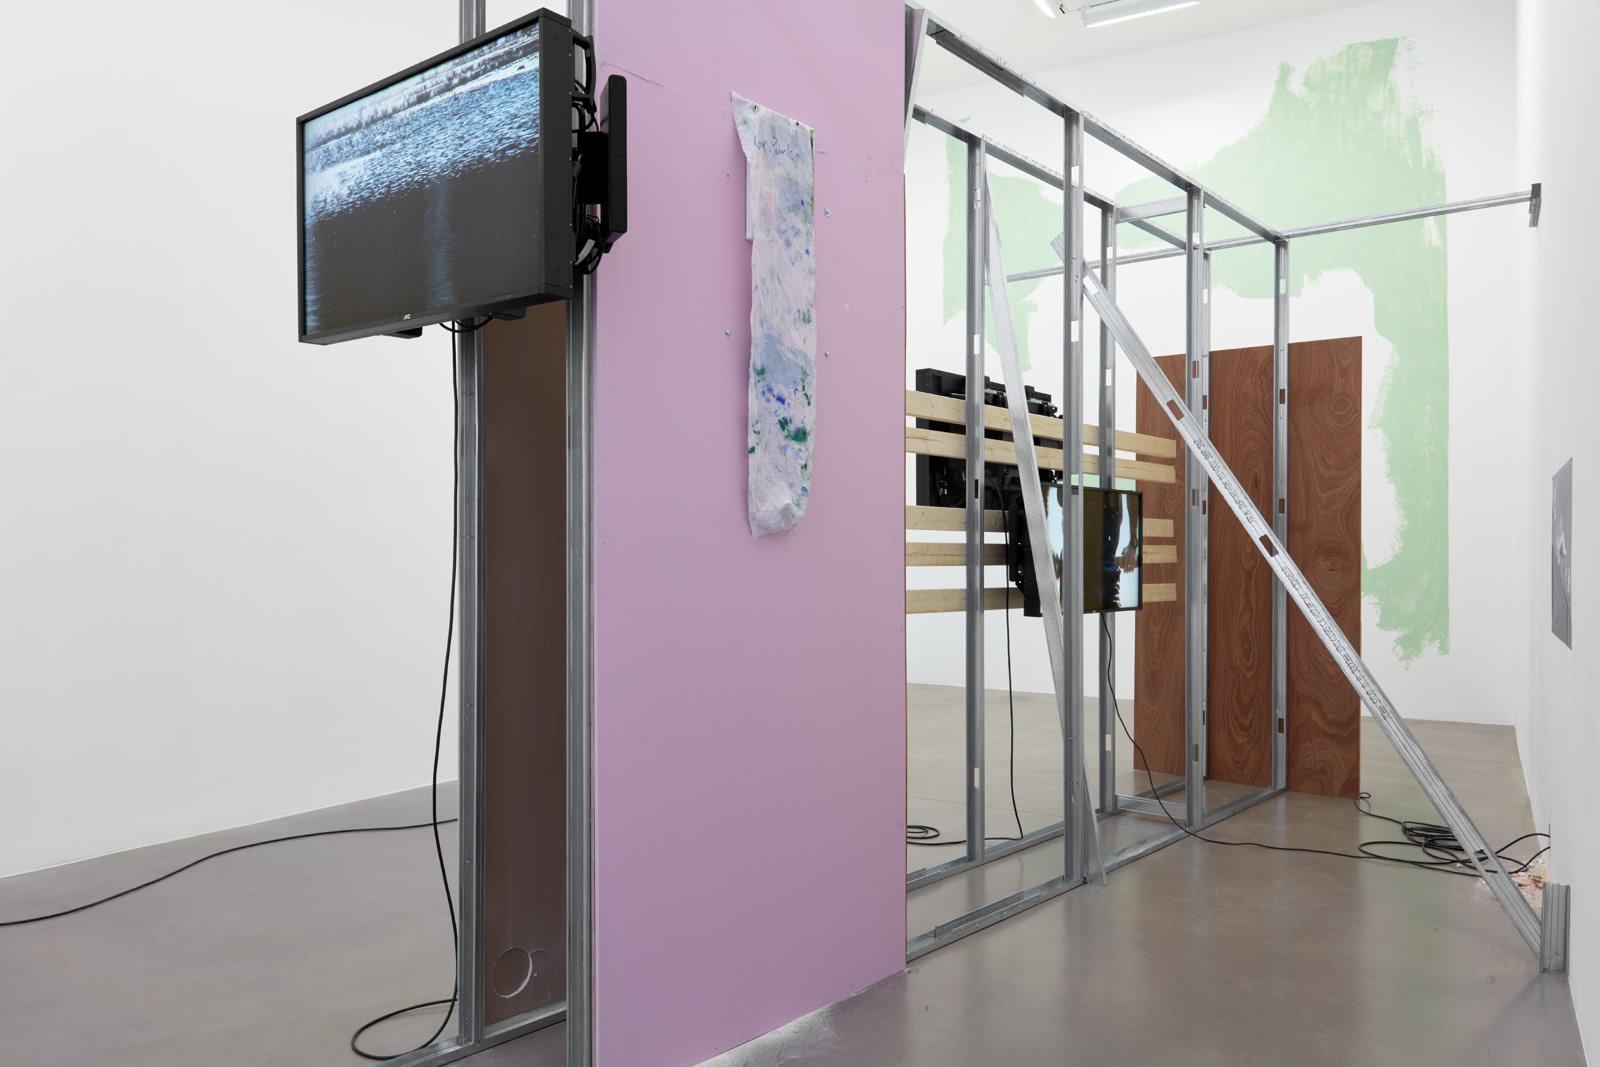 "<p>Installation view, Hilary Lloyd, Car Park, 2019, Sadie Coles HQ, London, 21 November – 20 December 2019</p><p class=""black-link cms_black"">Photography:RobertGlowacki</p>"